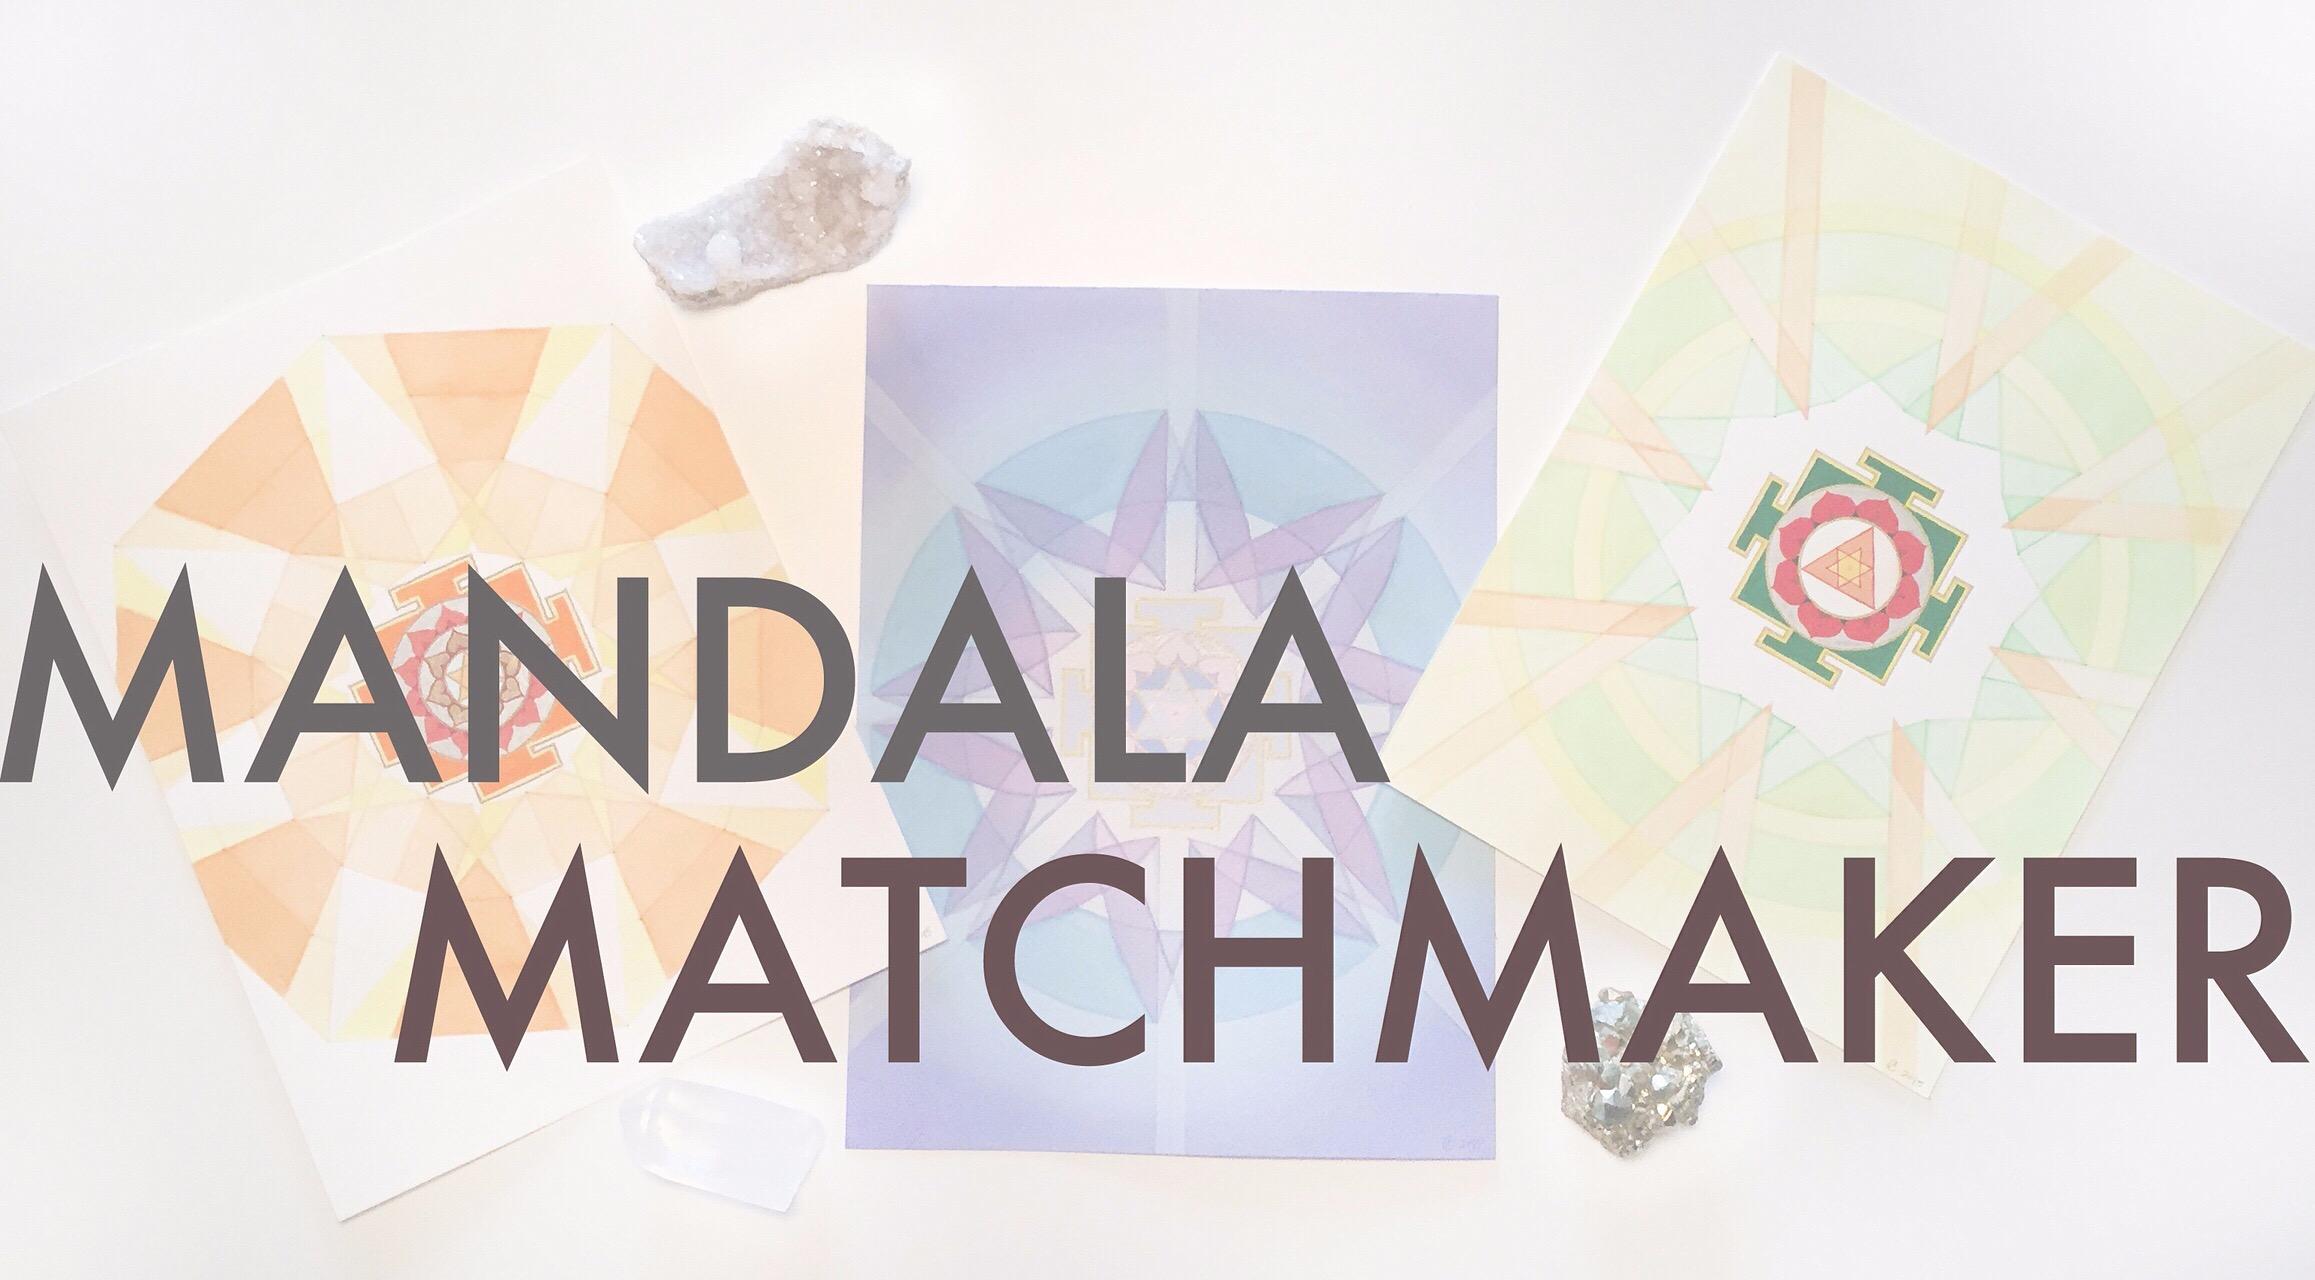 check out my new  #MandalaMatchmaker on  holisticspaces.com  - what  mandala  is best for you? #holisticspaces  #mandala  #sacredart  #fengshui